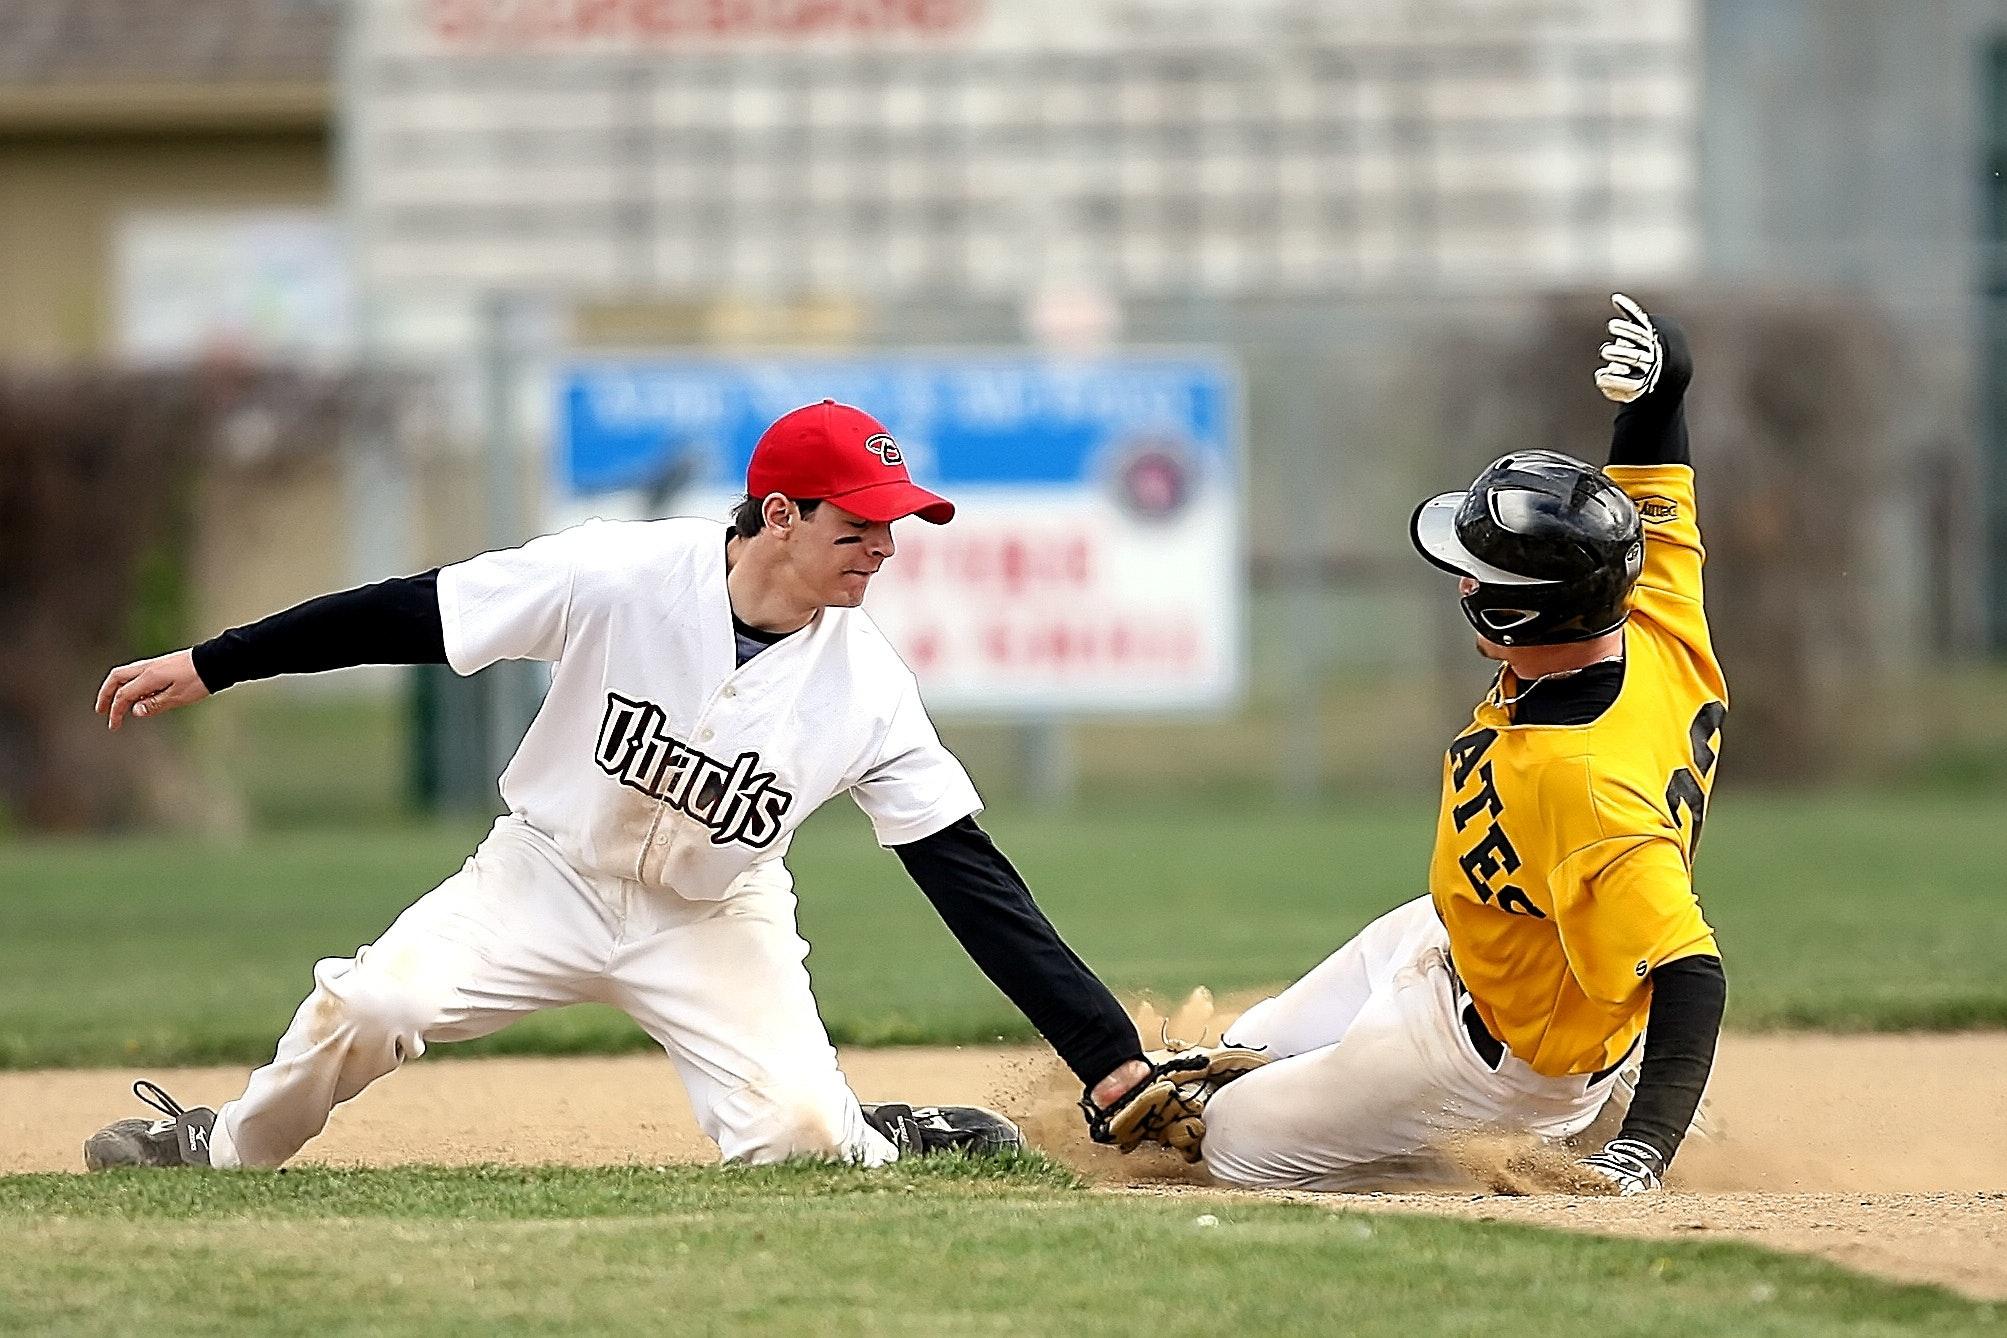 Baseball Game · Free Stock Photo